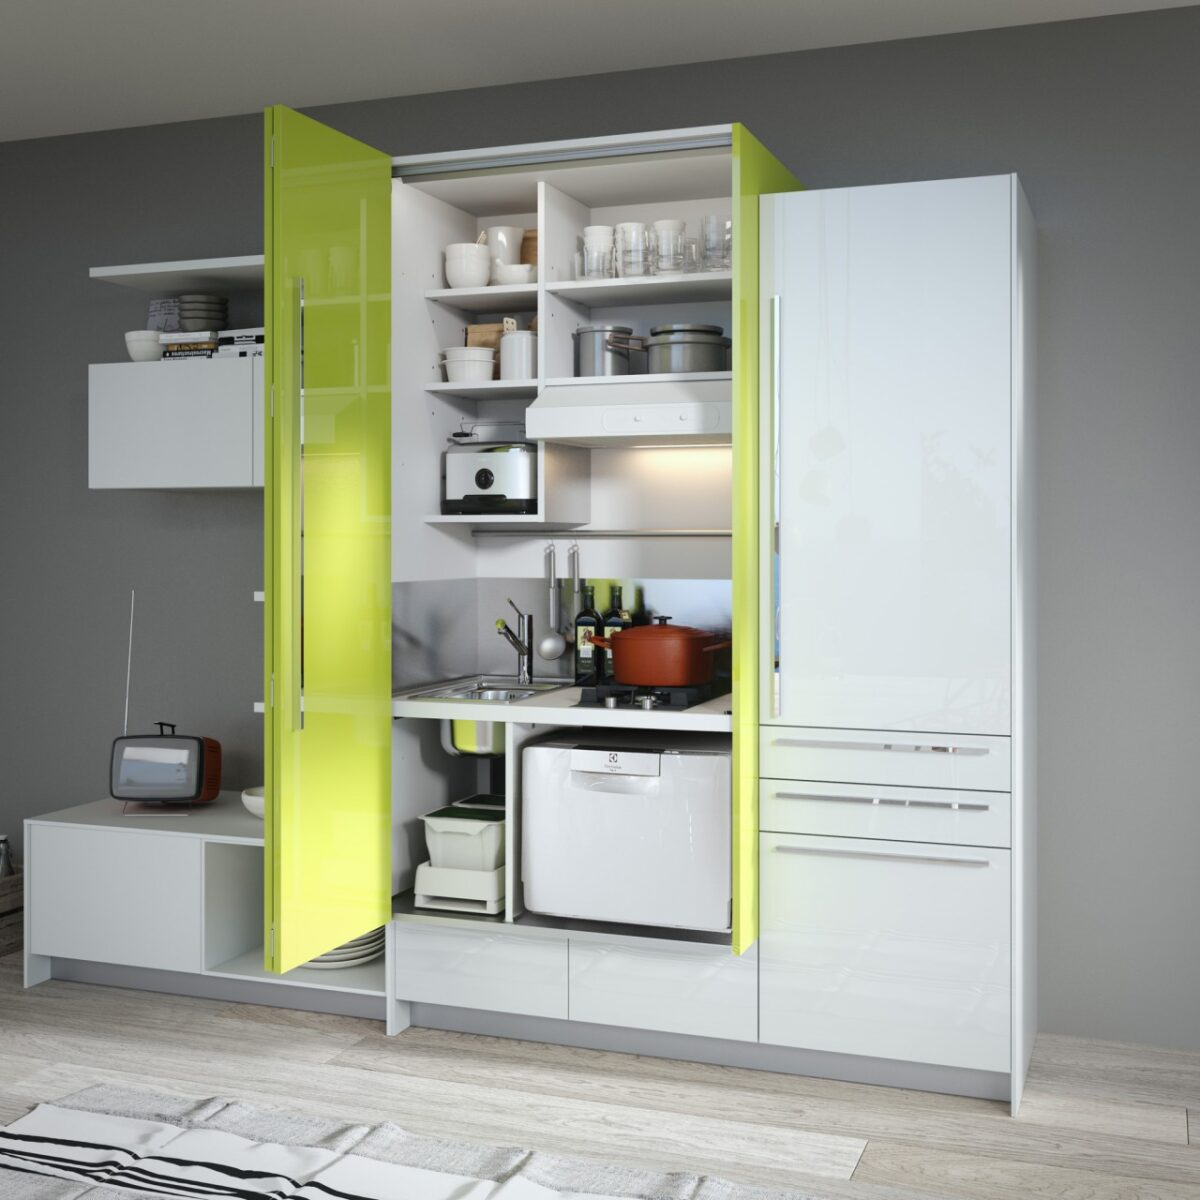 cucina-monoblocco-15